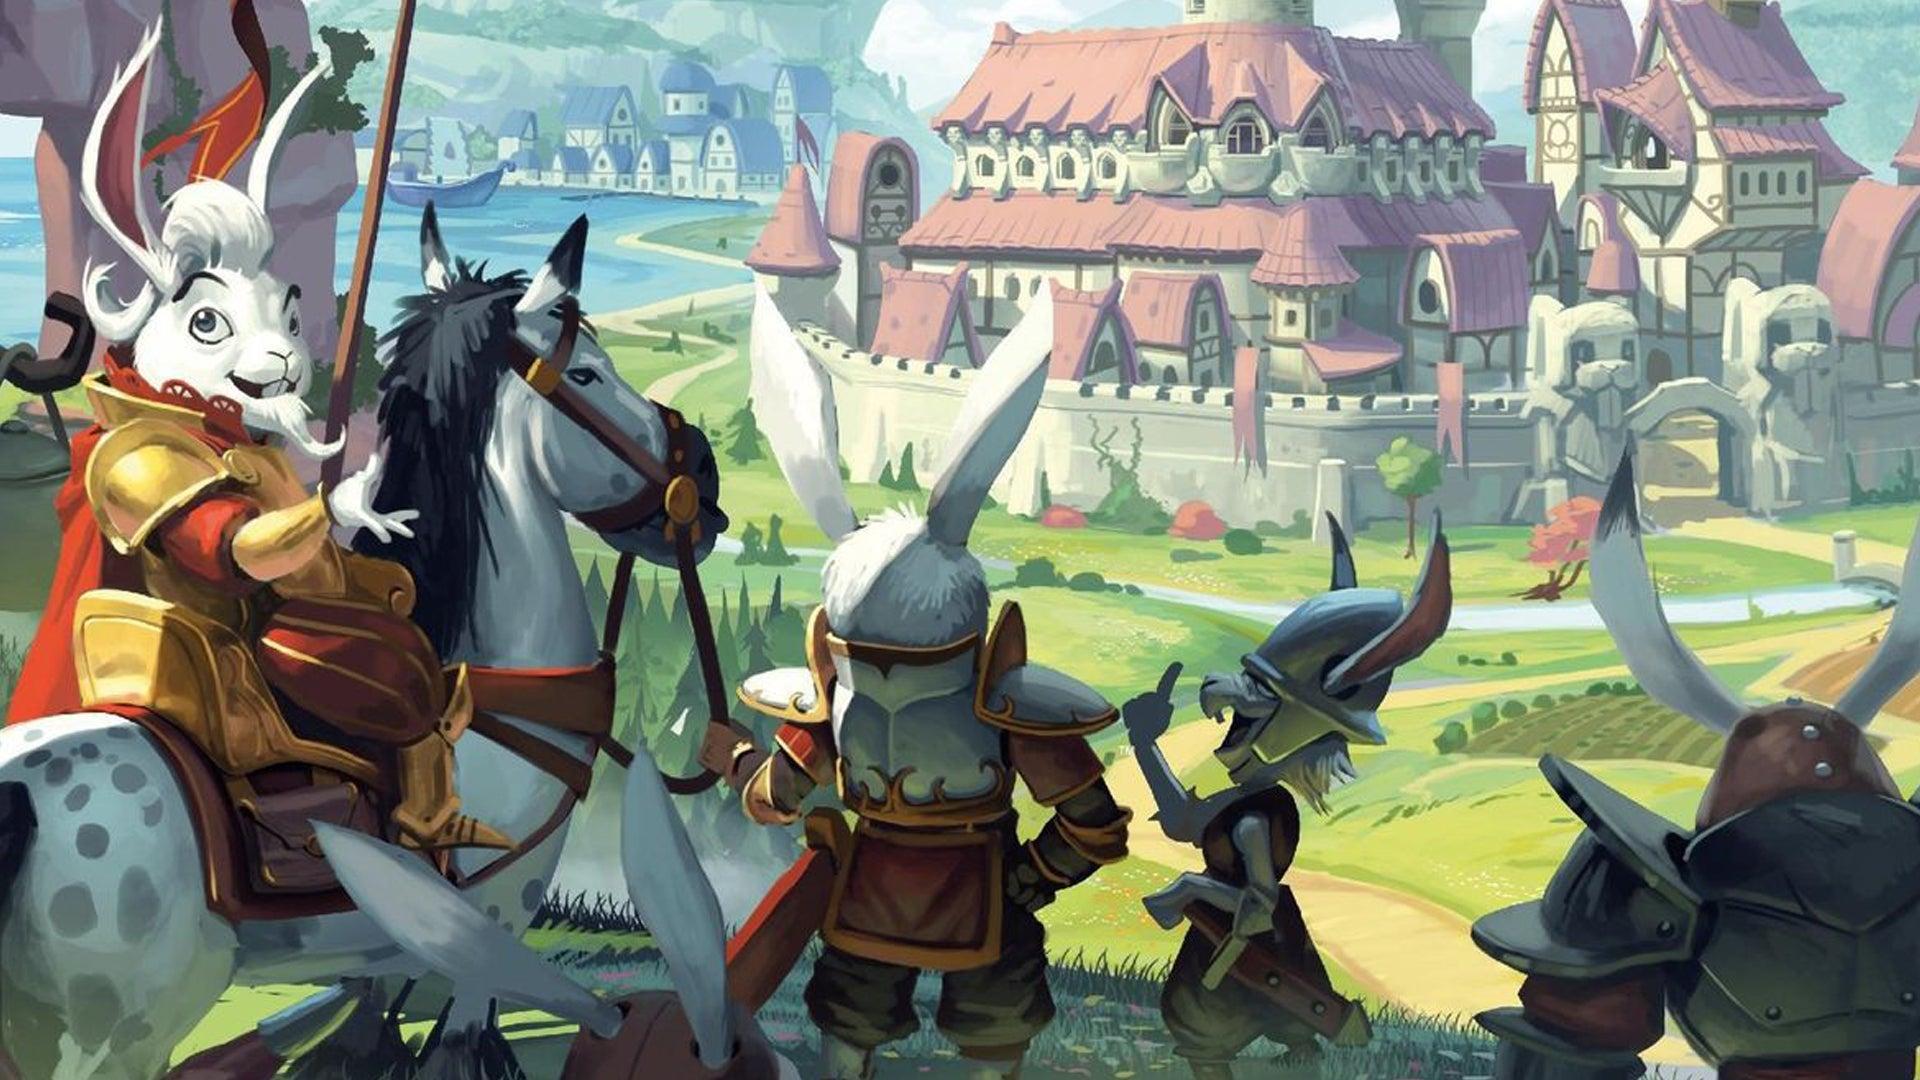 Bunny Kingdom board game artwork